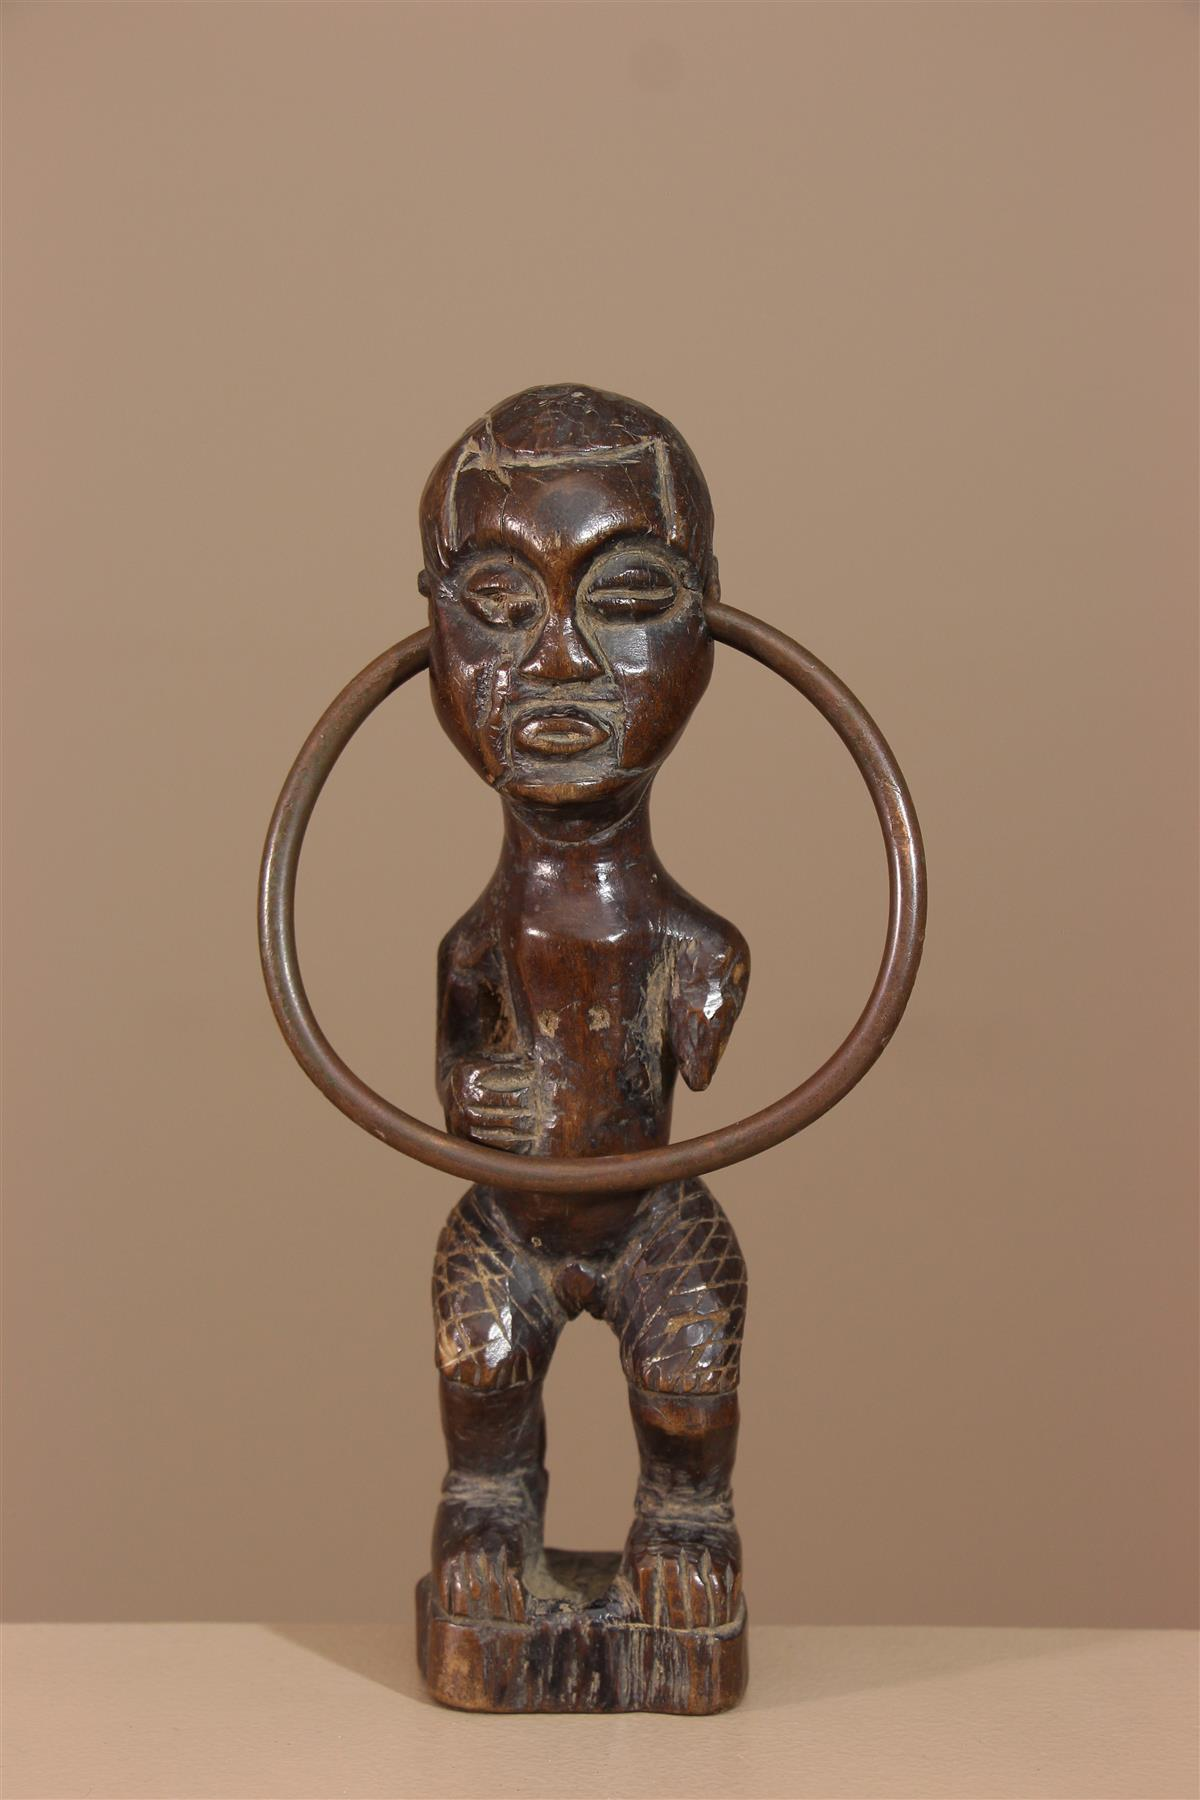 Fétiche africain - Déco africaine - Art africain traditionnel